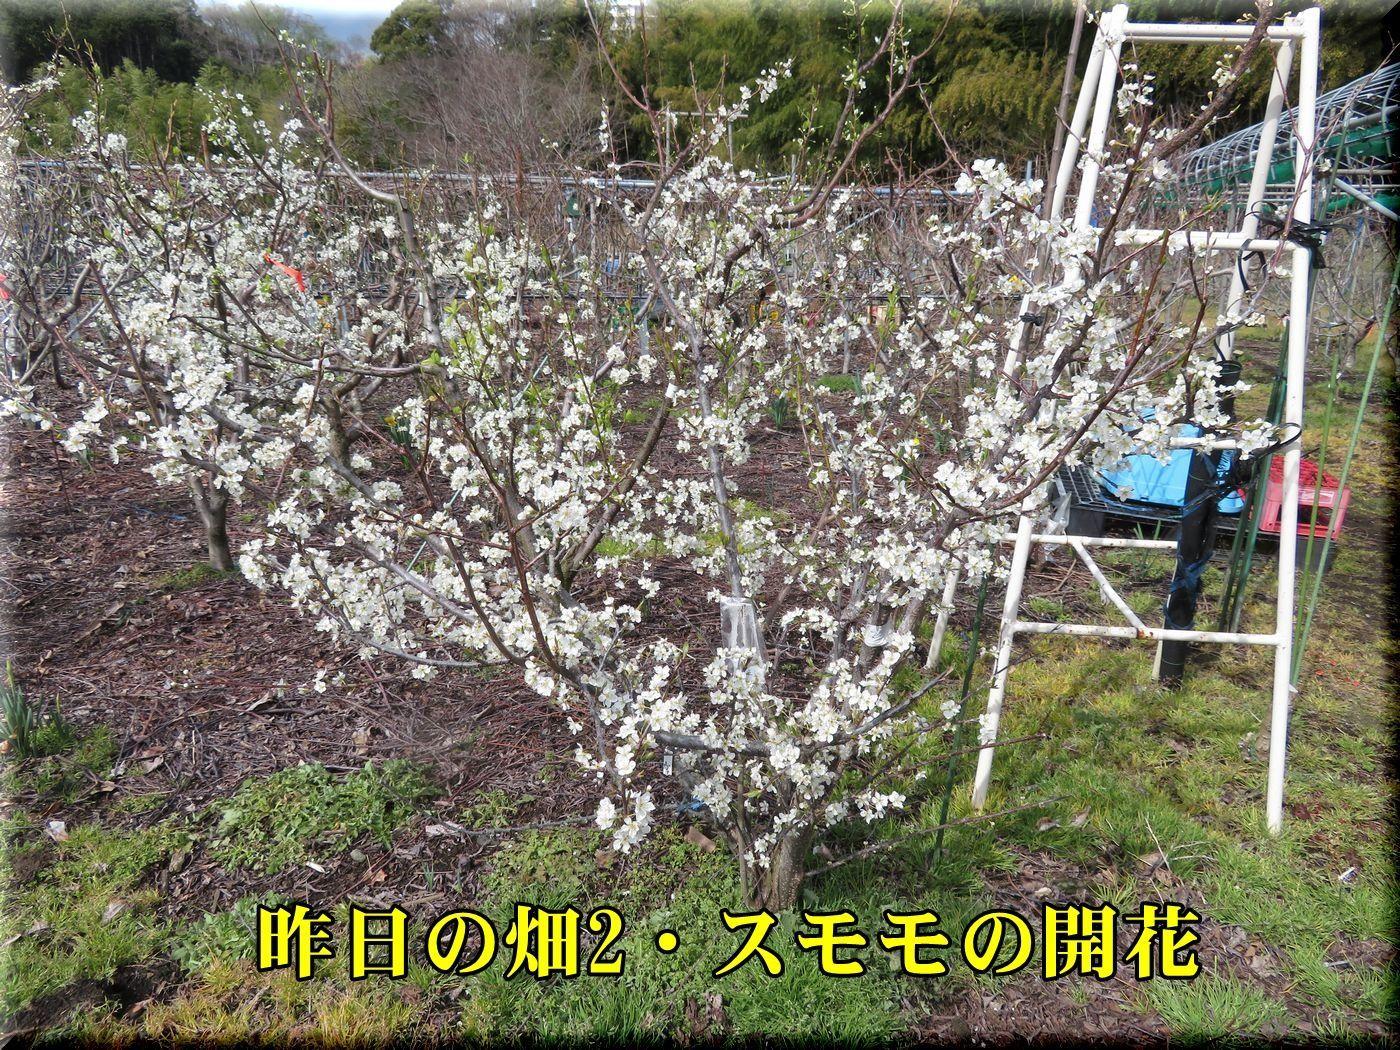 1sumomo180324.jpg